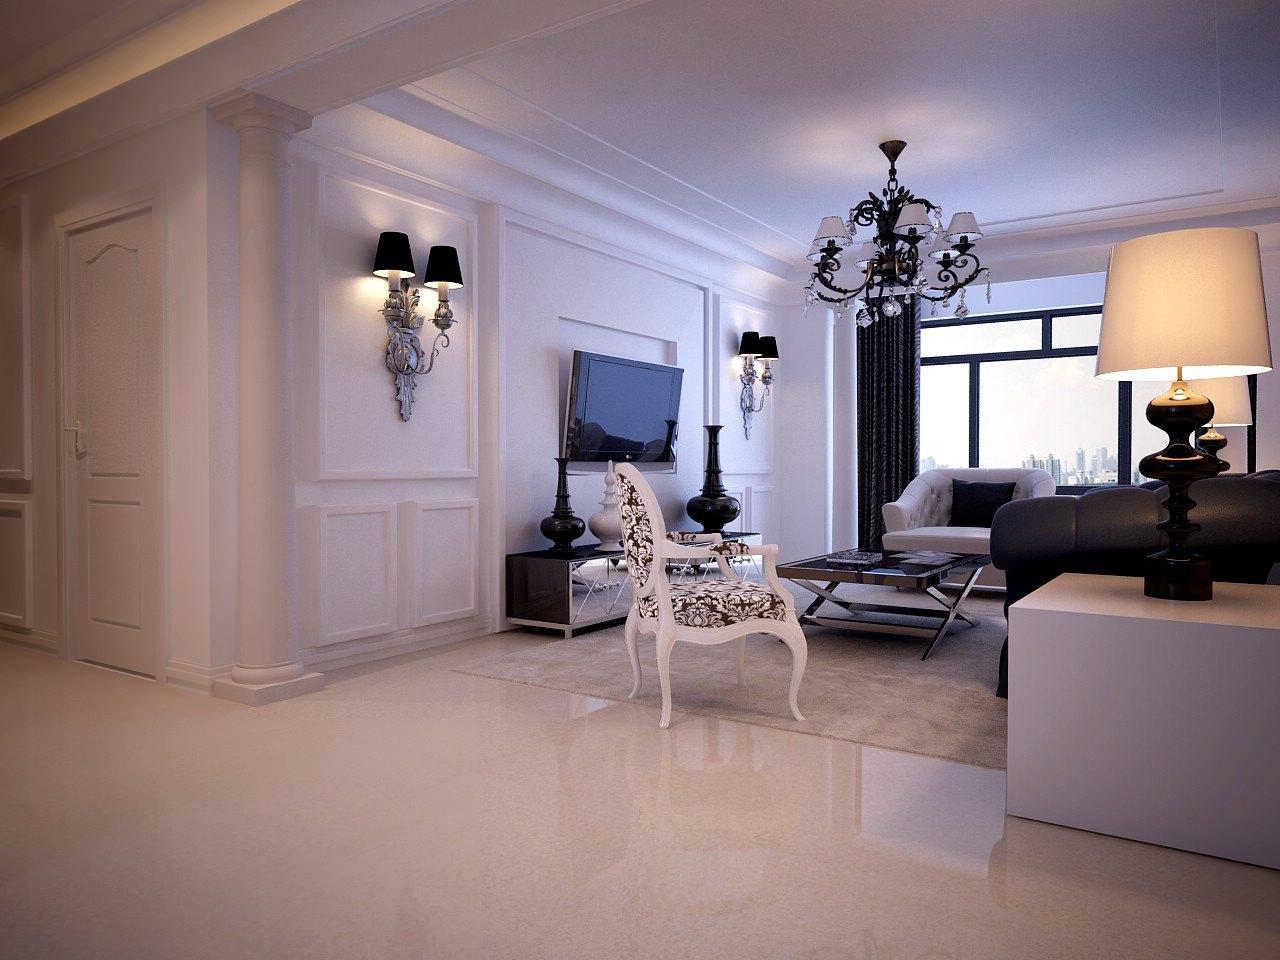 Light living room 3d model max for Living room 3d max